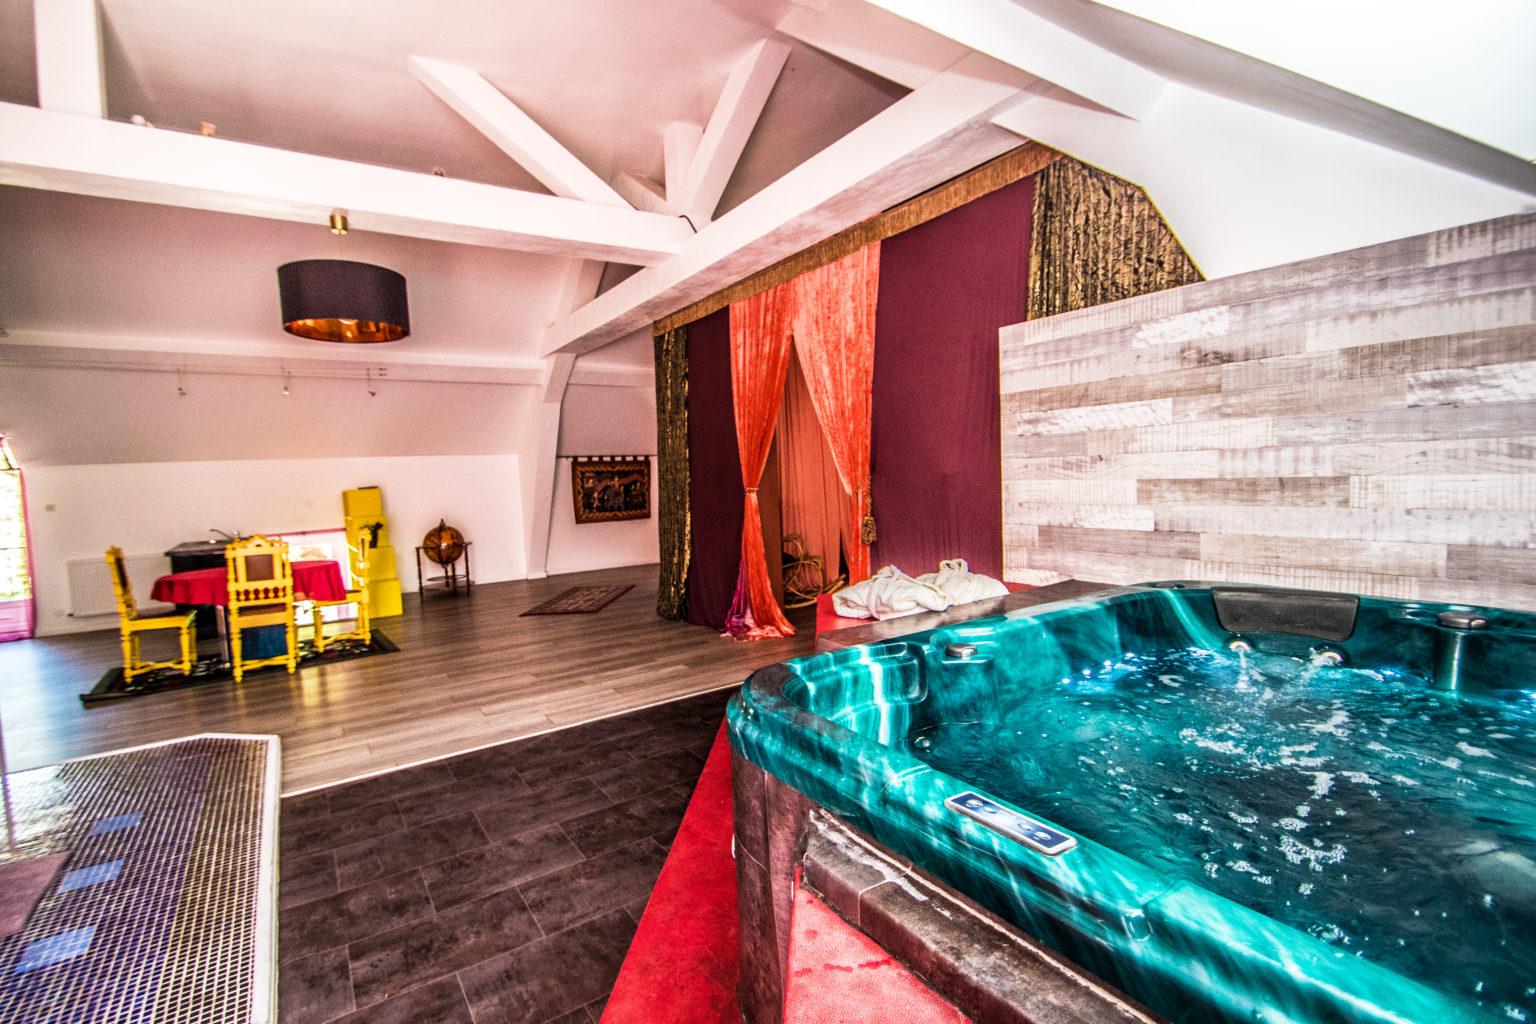 LA FONT VINEUSE HOTEL & SPA - HEBERGEMENT CHARME & INSOLITE 2019-0076LA FONT VINEUSE HOTEL & SPA